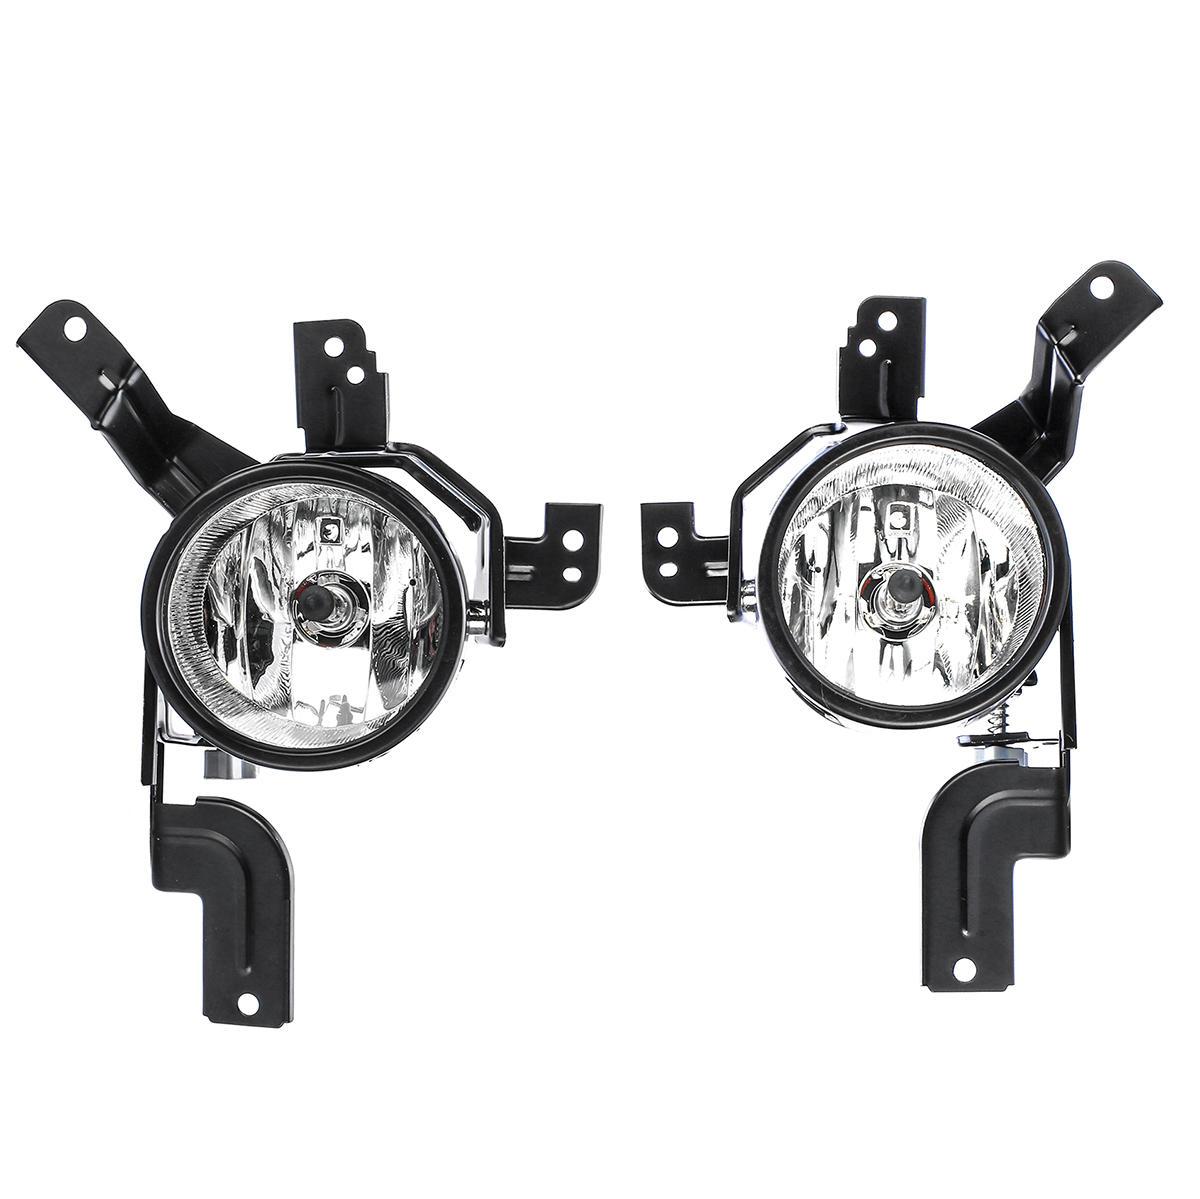 Car Front Left/Right Fog Lights Lamps with H11 Halogen Bulb For Honda CR-V CRV 2007-2009